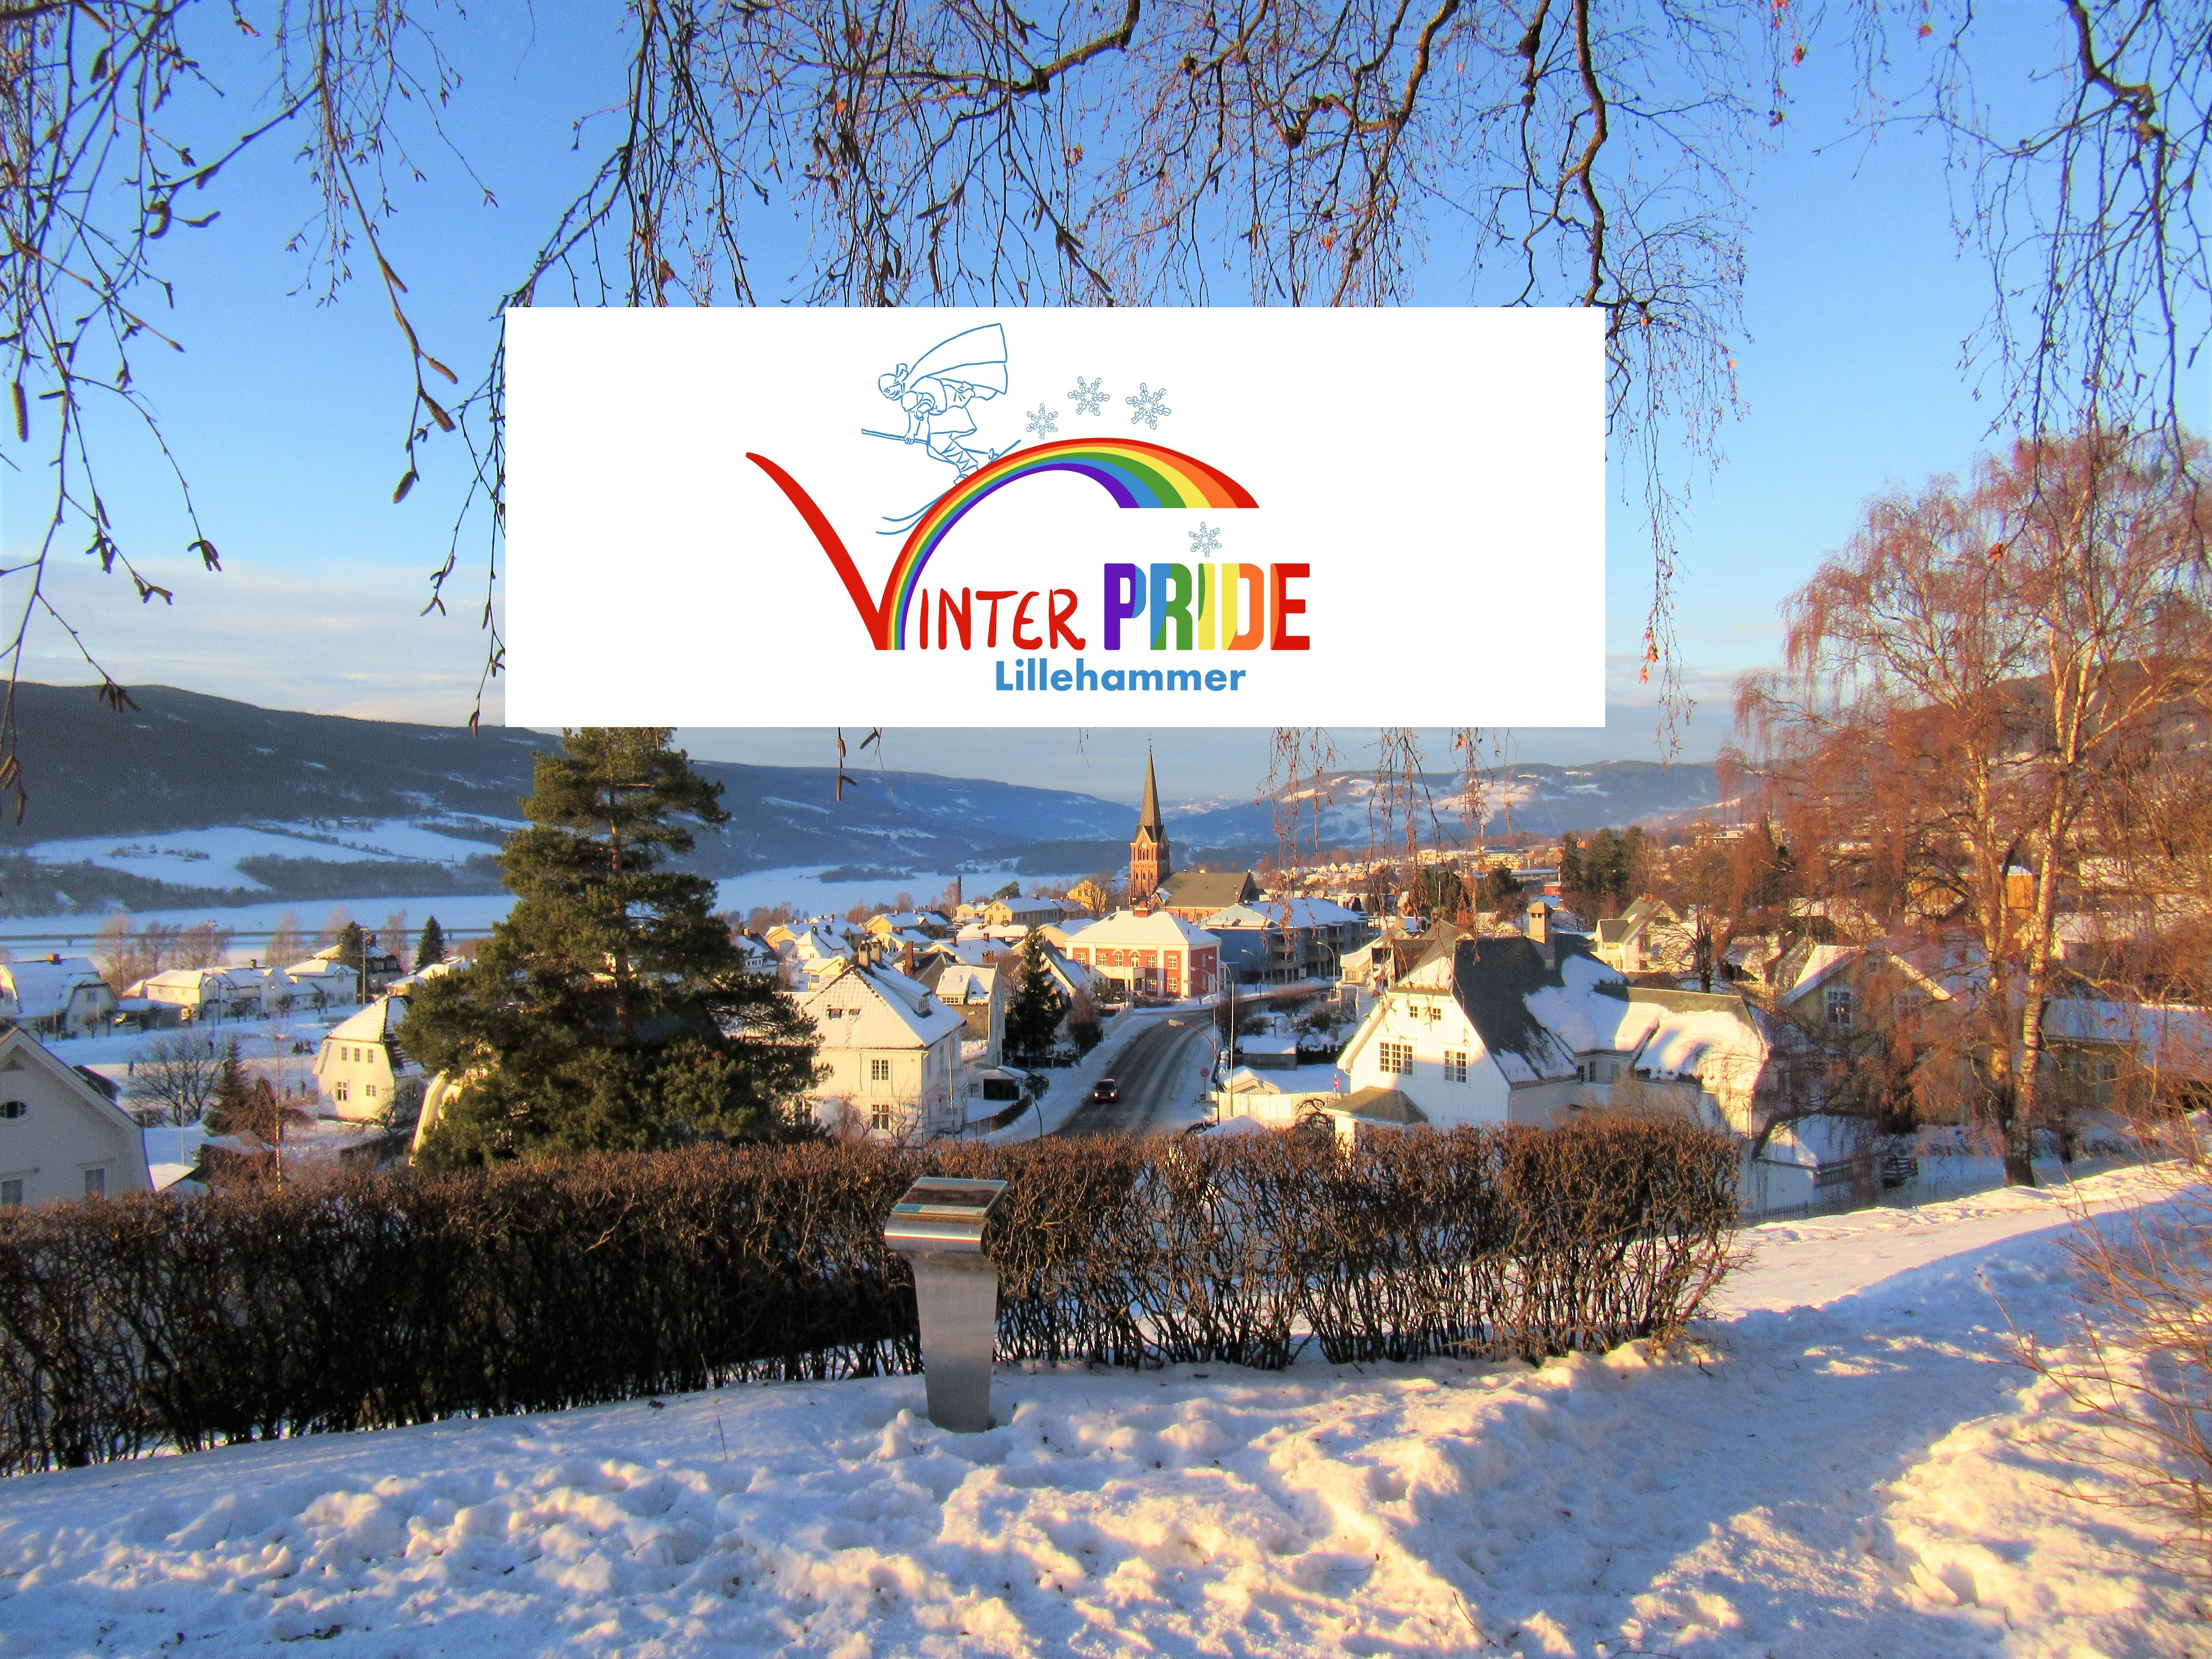 Winter pride Lillehammer